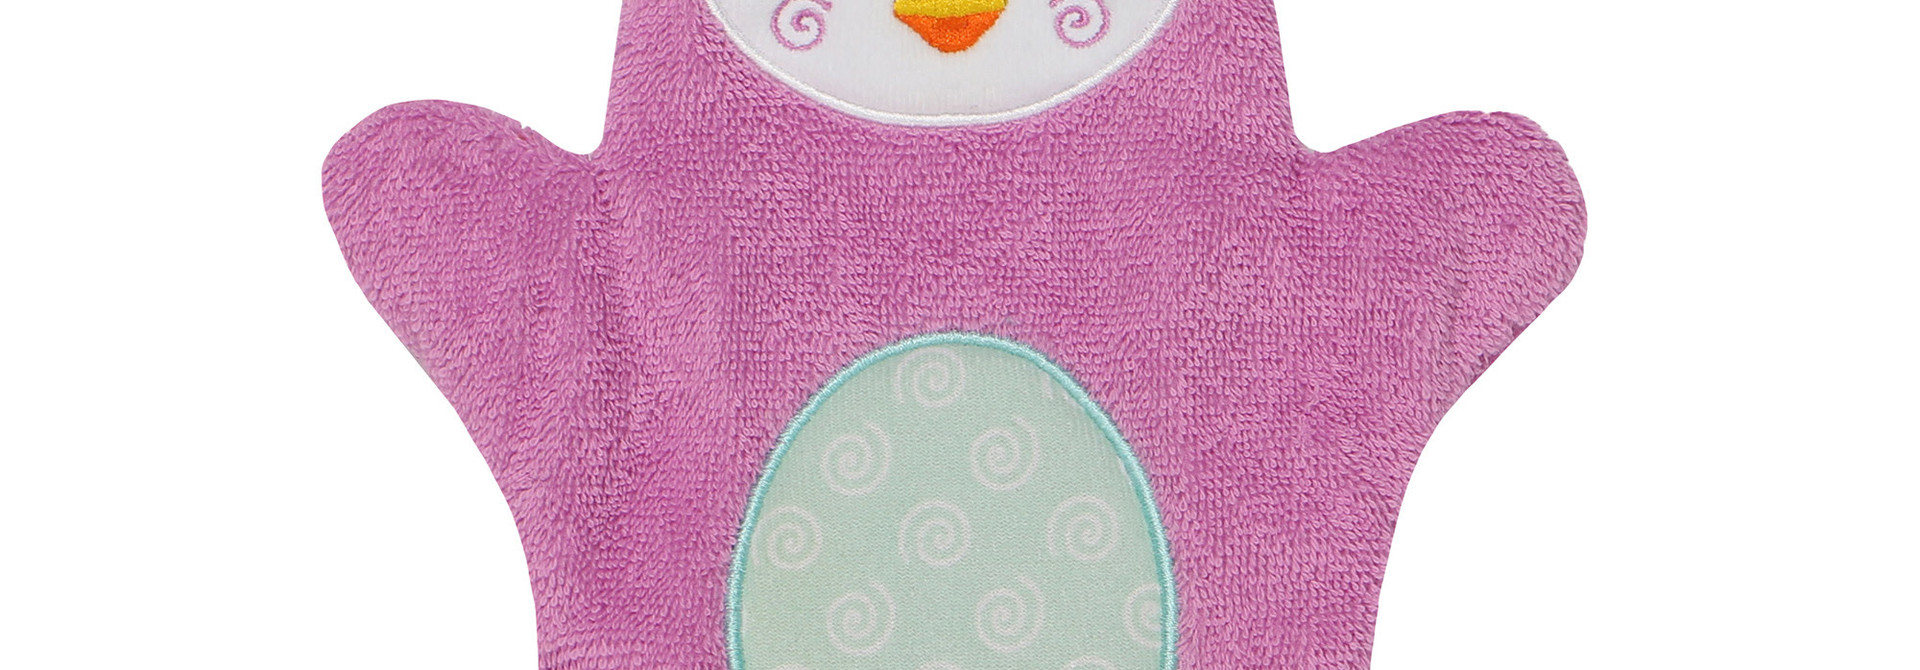 Mitaine pour le bain - Penny Pingouin